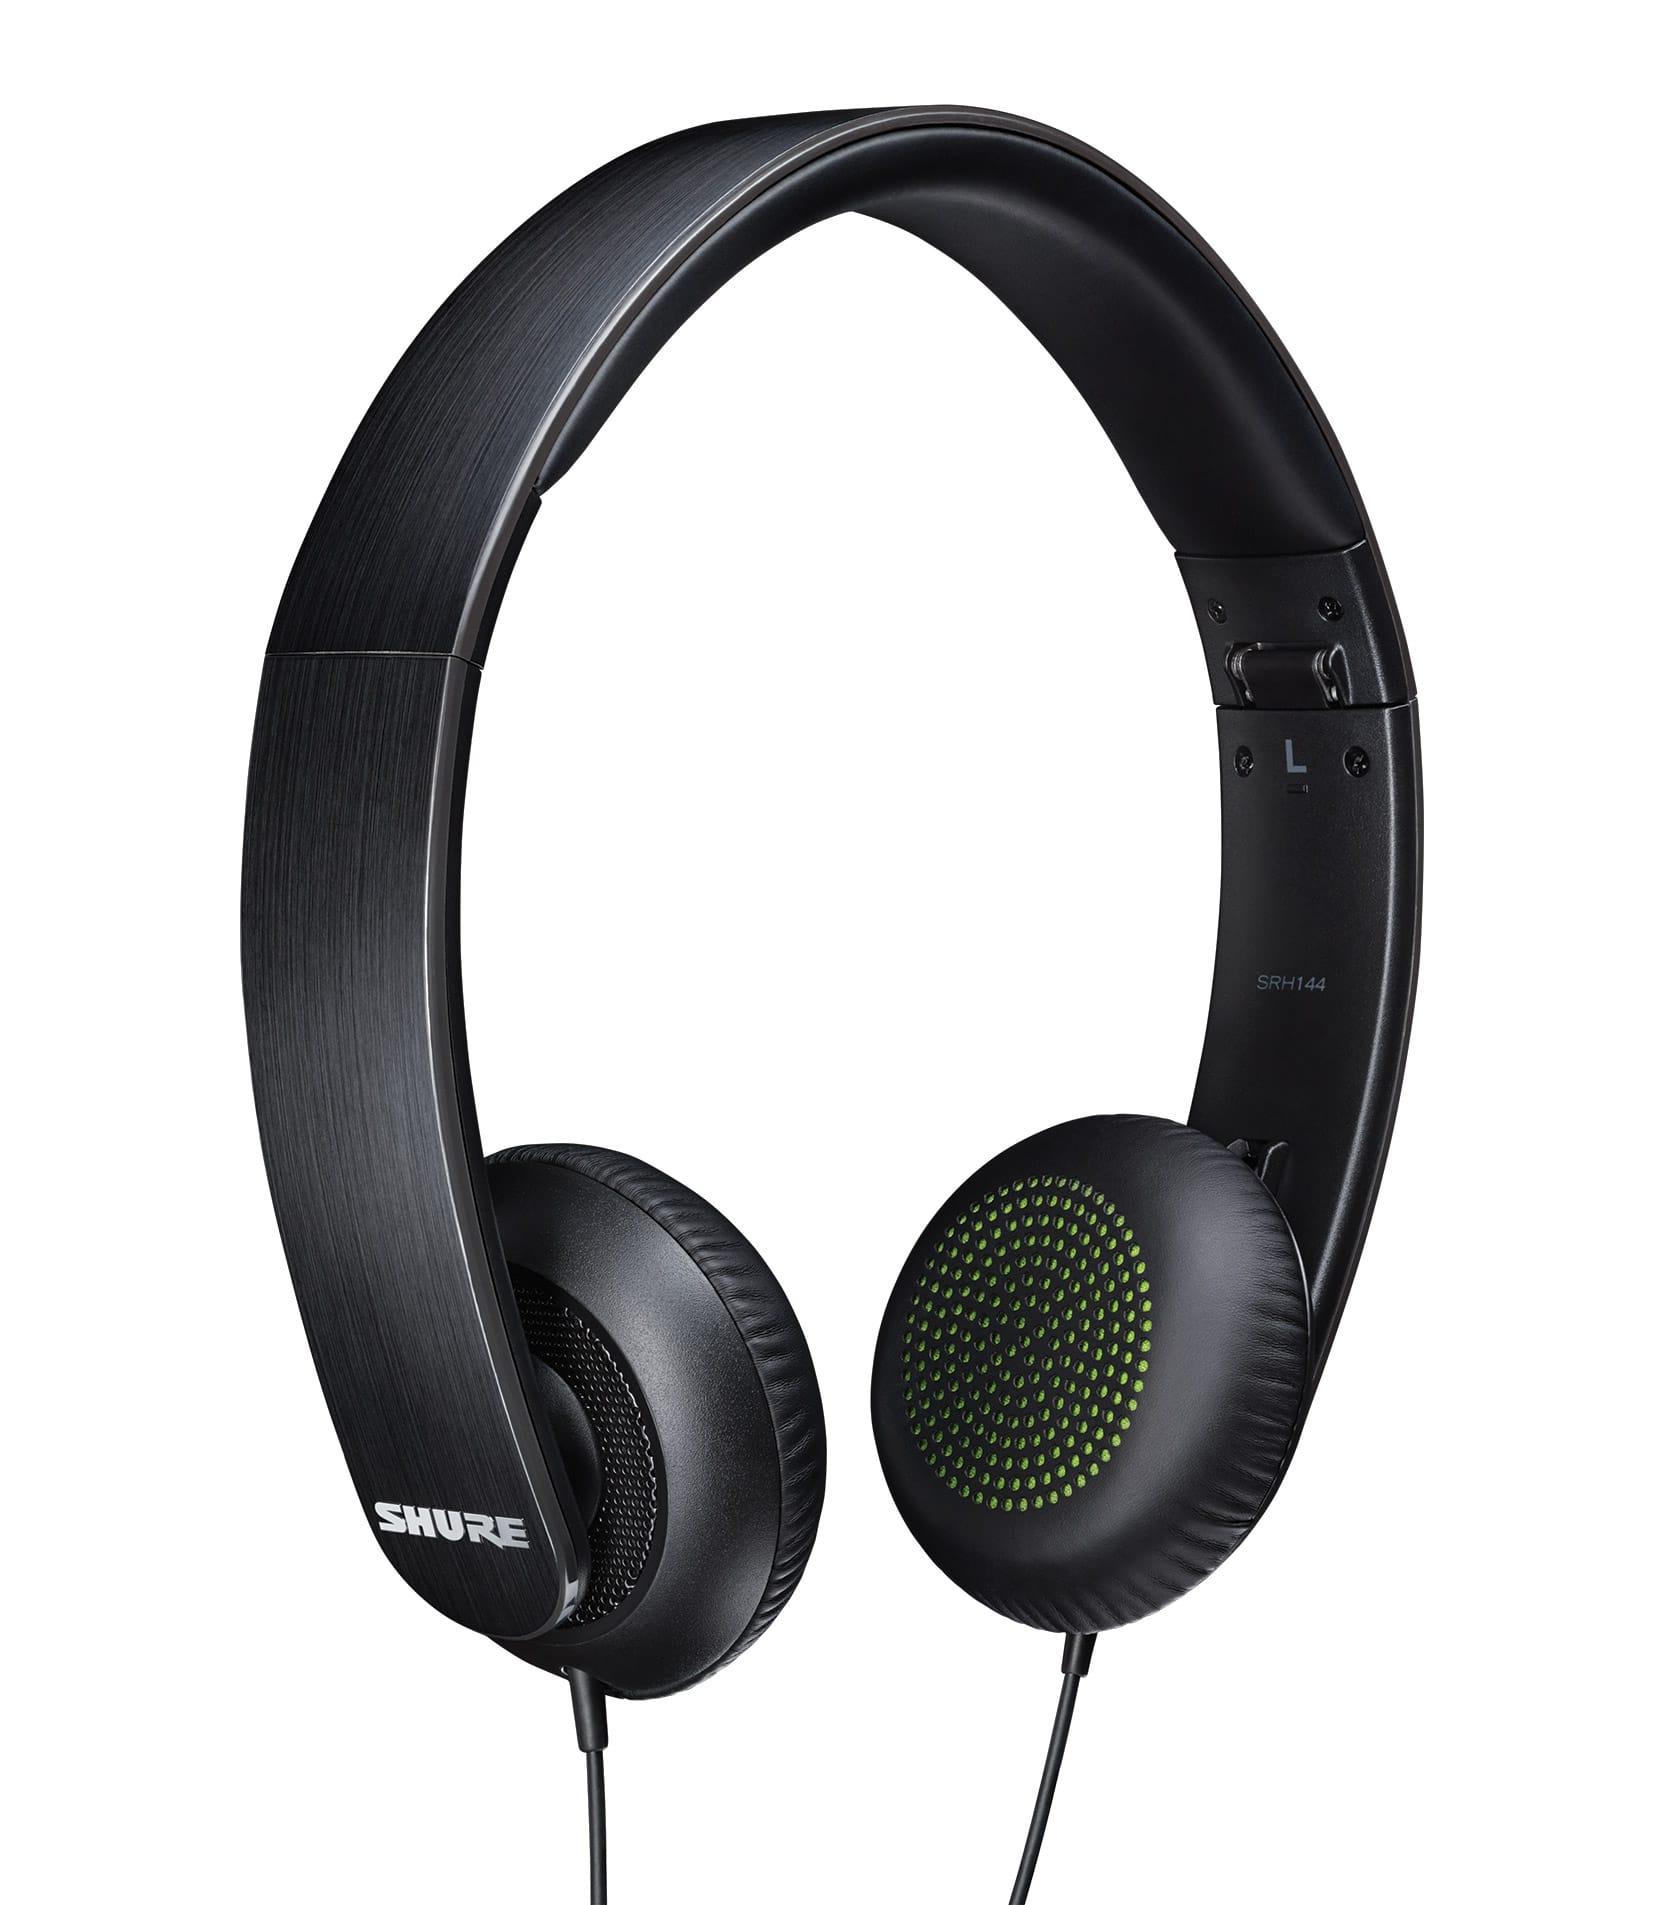 Shure - SRH144 Portable Semi Open Headphones - Melody House